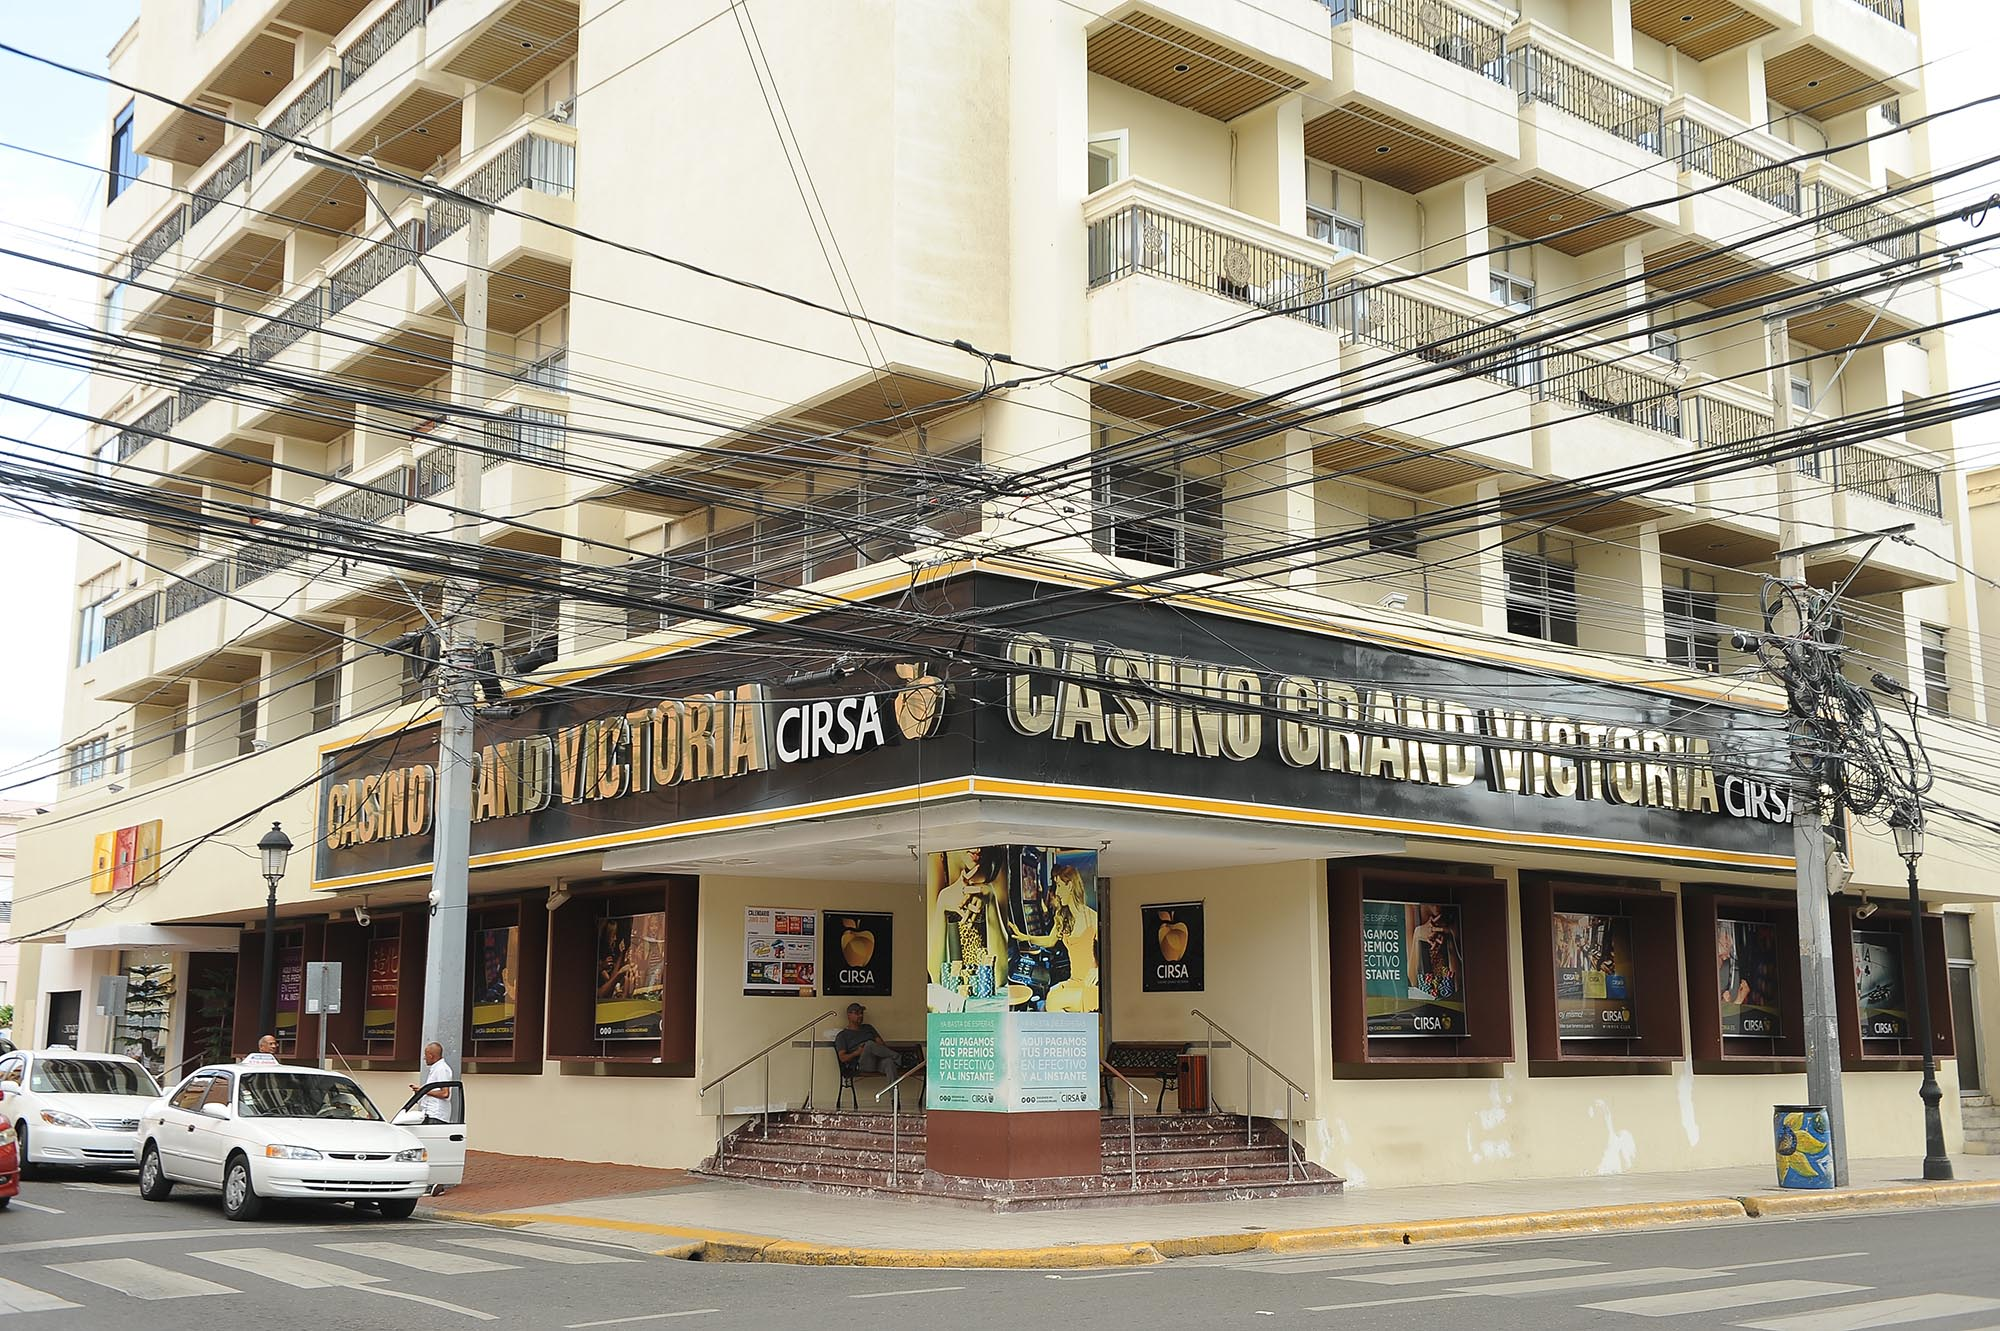 Casino Gran Victoria exterior